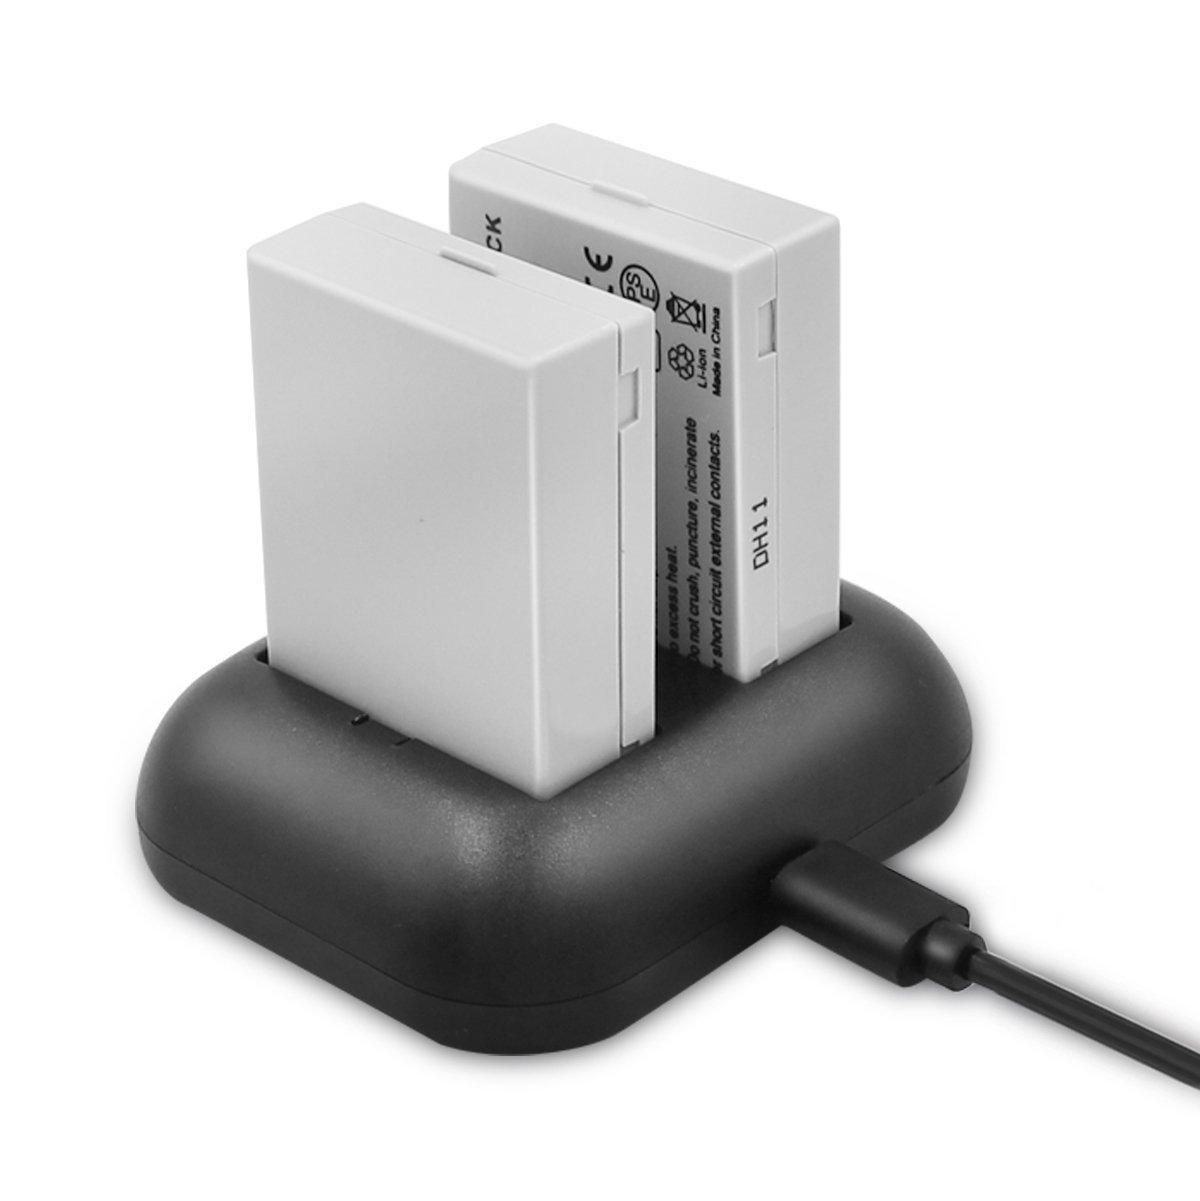 ENEGON Batería de repuesto (paquete de 2) y cargador rápido rápido para Canon LP-E8 y Canon EOS Rebel T2i, T3i, T4i, T5i, EOS 550D, 600D, 650D, 700D, Kiss X4, X5, X6 y LC-E8E Cámara digital